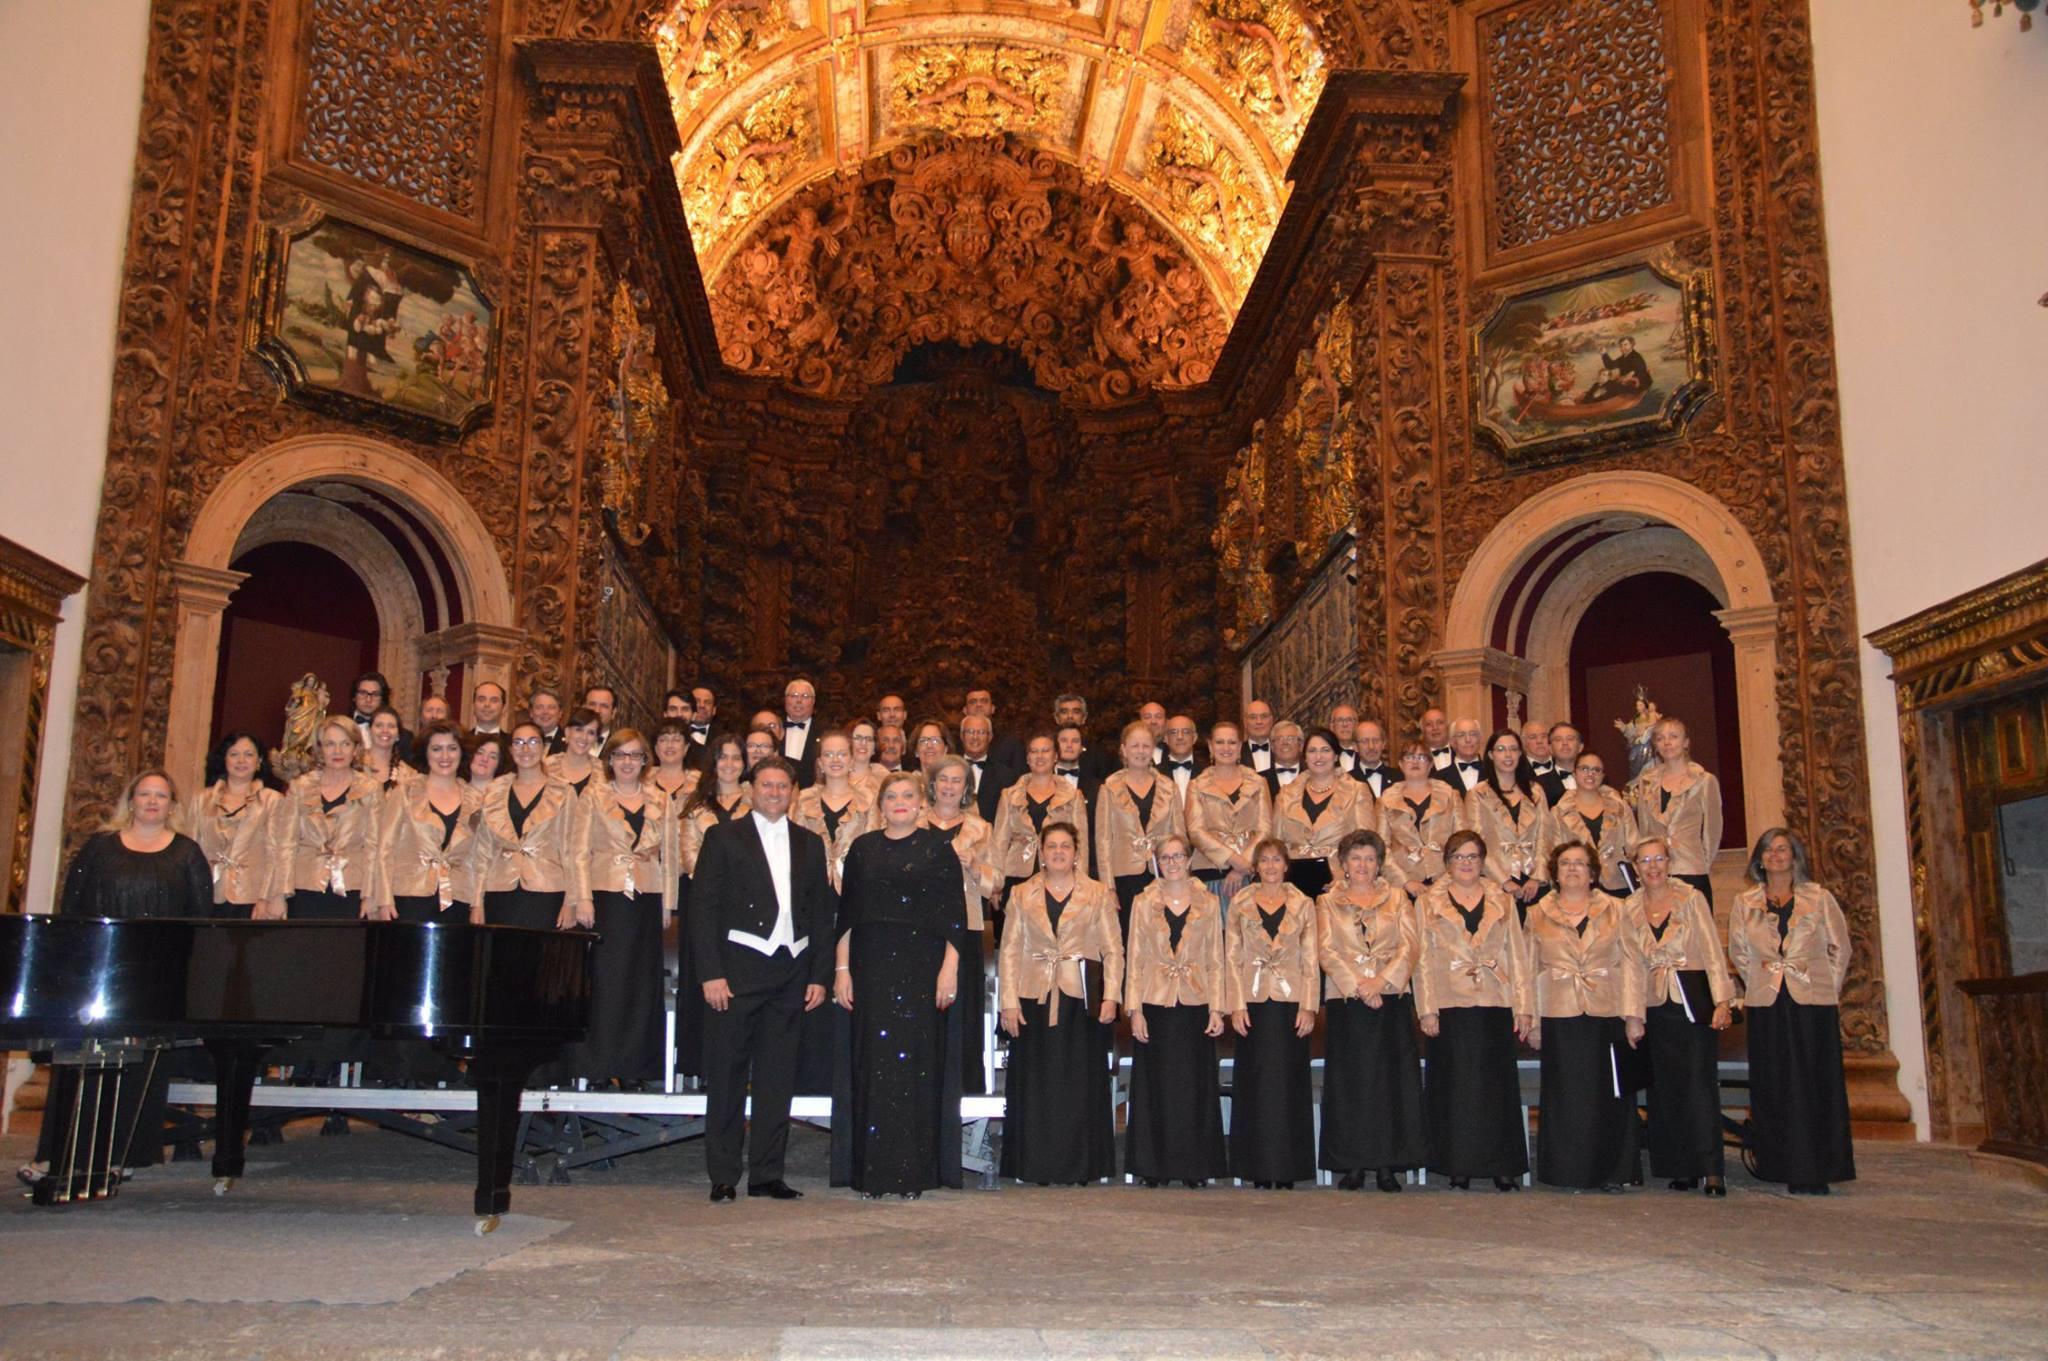 Gala de Ópera | Coral de São José